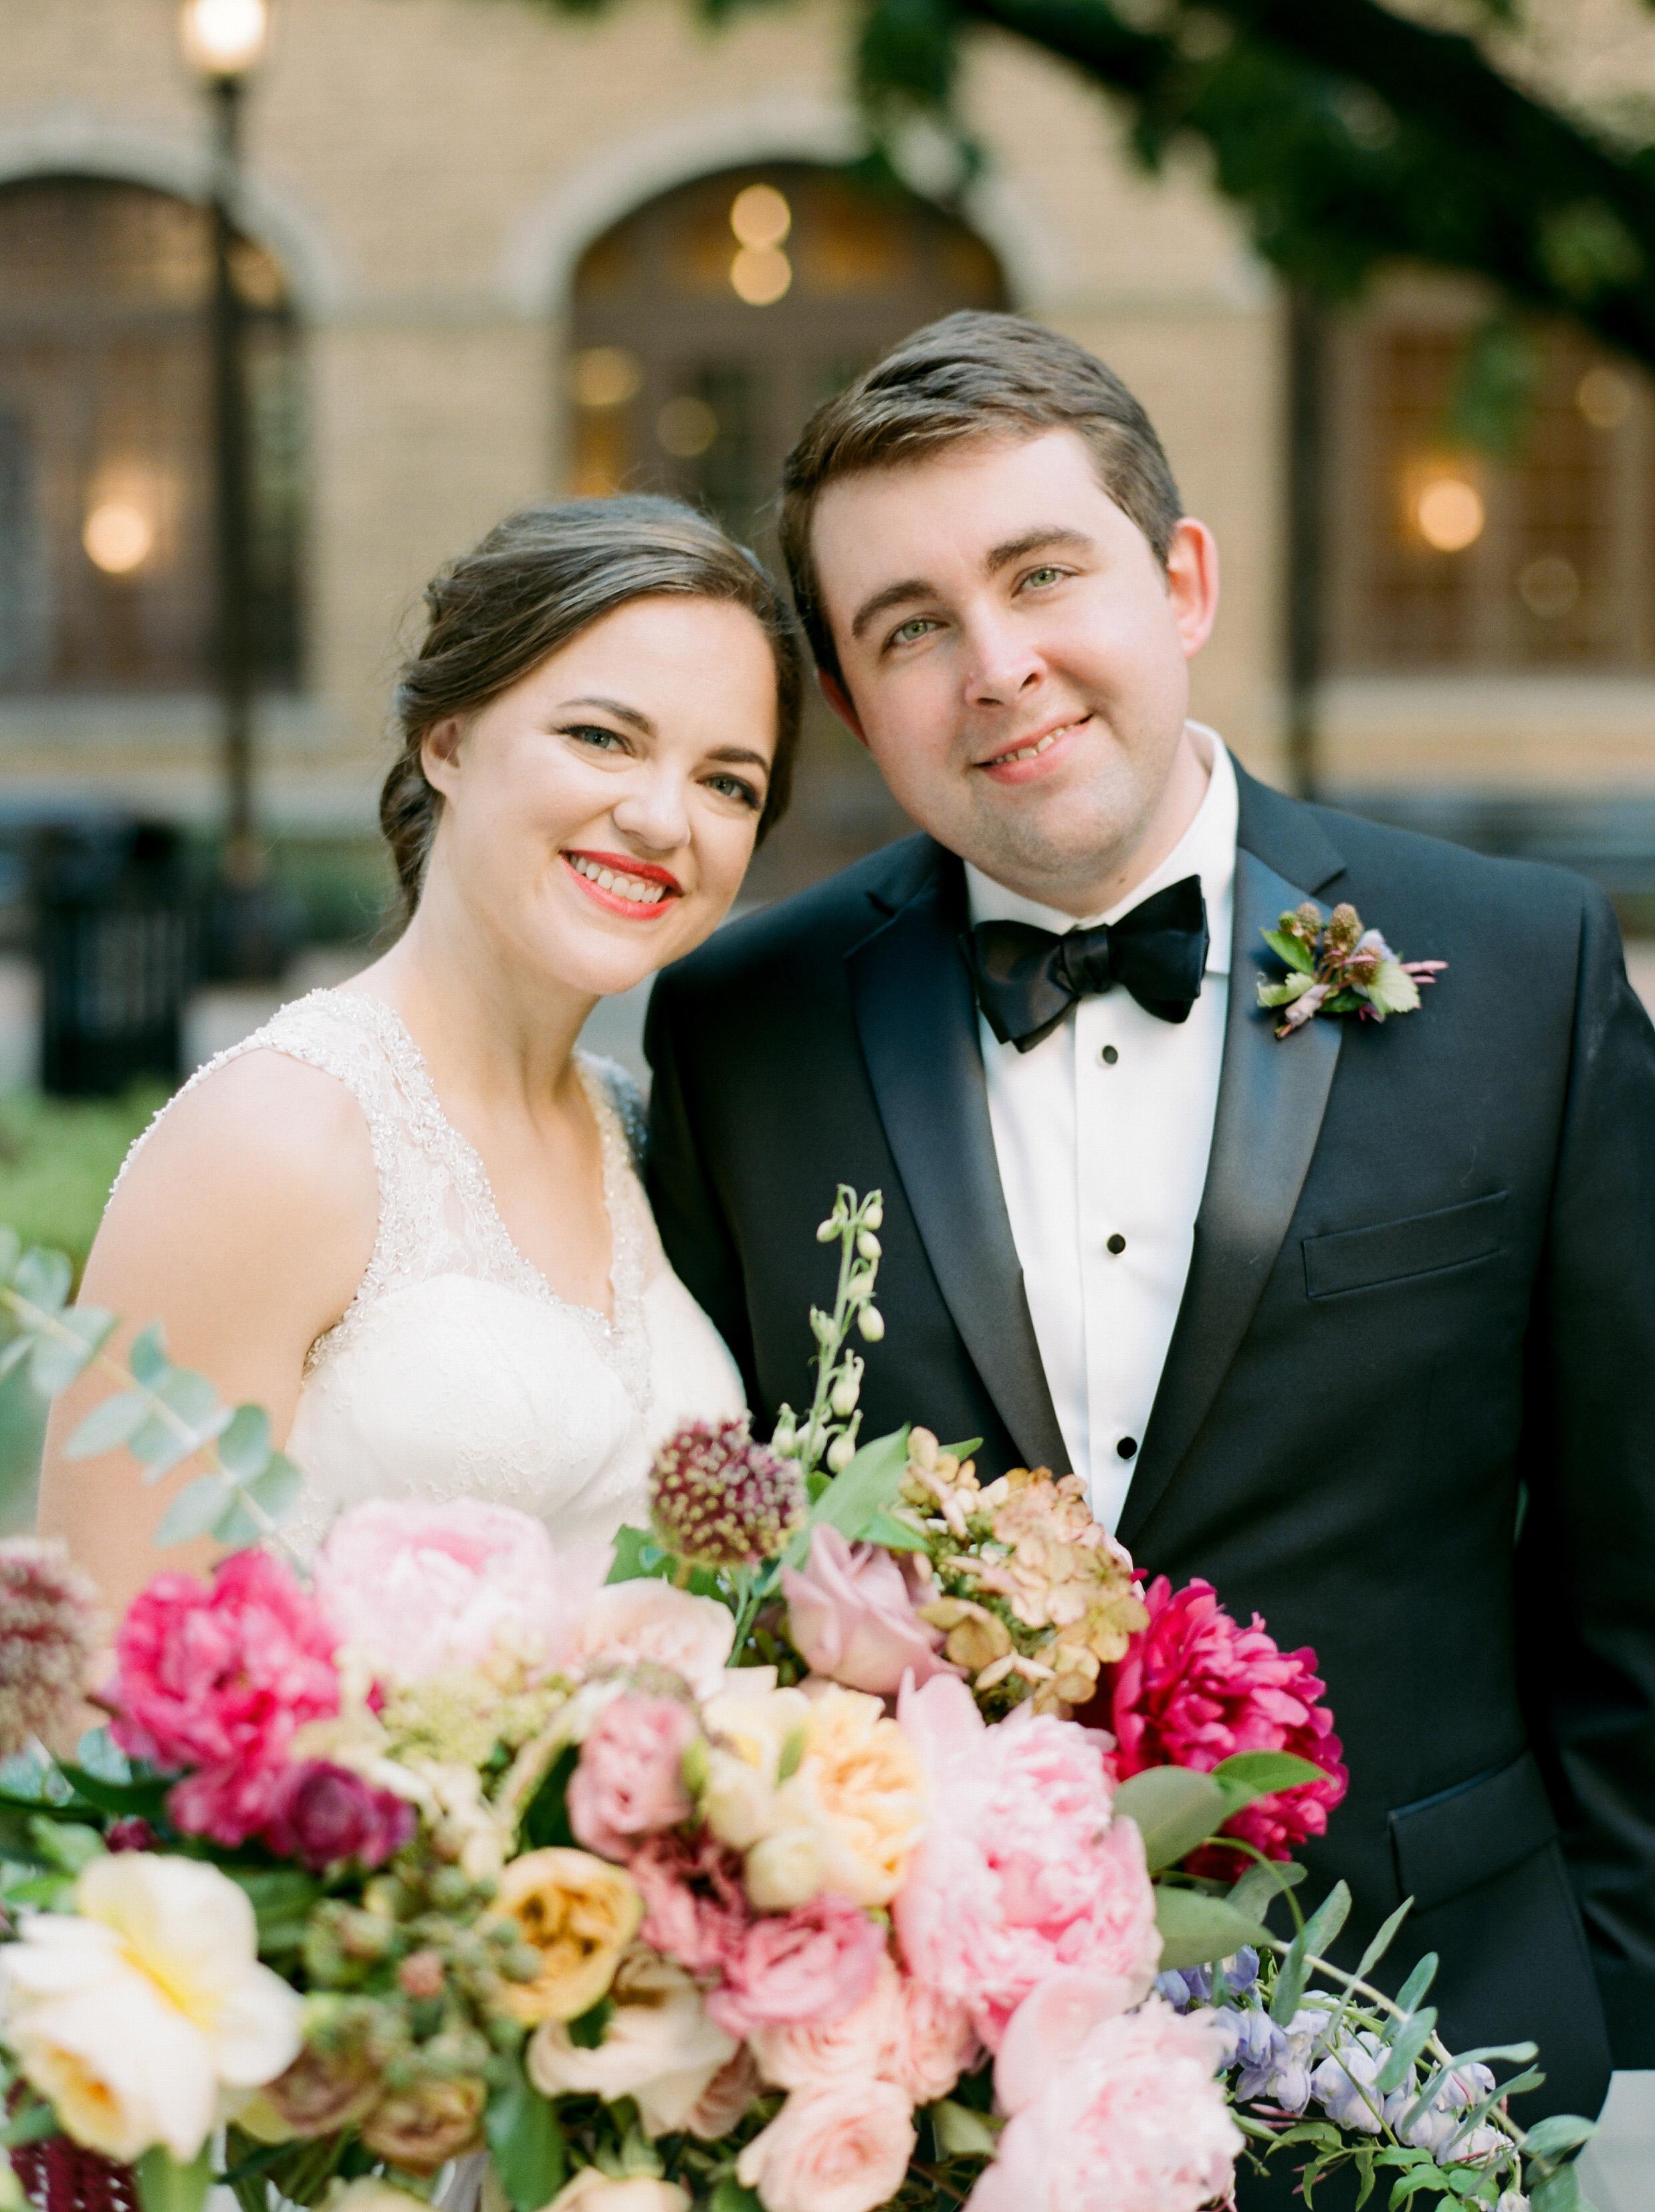 The-Knot-Texas-Fine-Art-Wedding-Film-Destination-Photographer-Houston-Austin-Dallas-New-Orleans-Julia-Ideson-Library-Event-Dana-Josh-Fernandez-Photograph-Top-Best-45.jpg